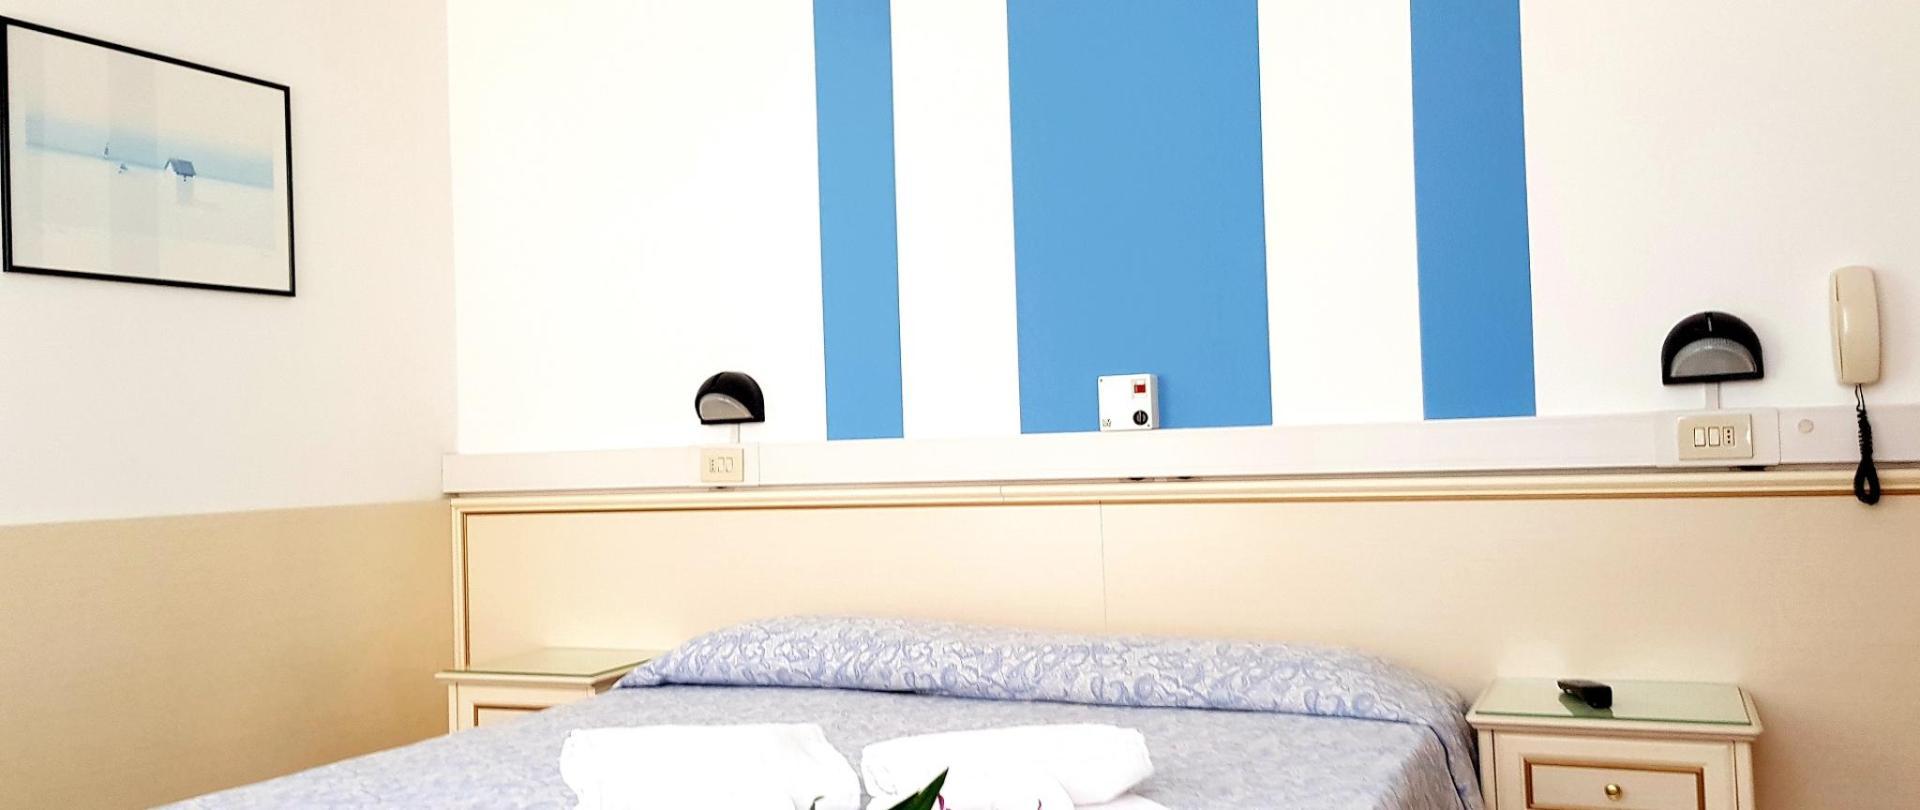 camera bianca 2.jpg